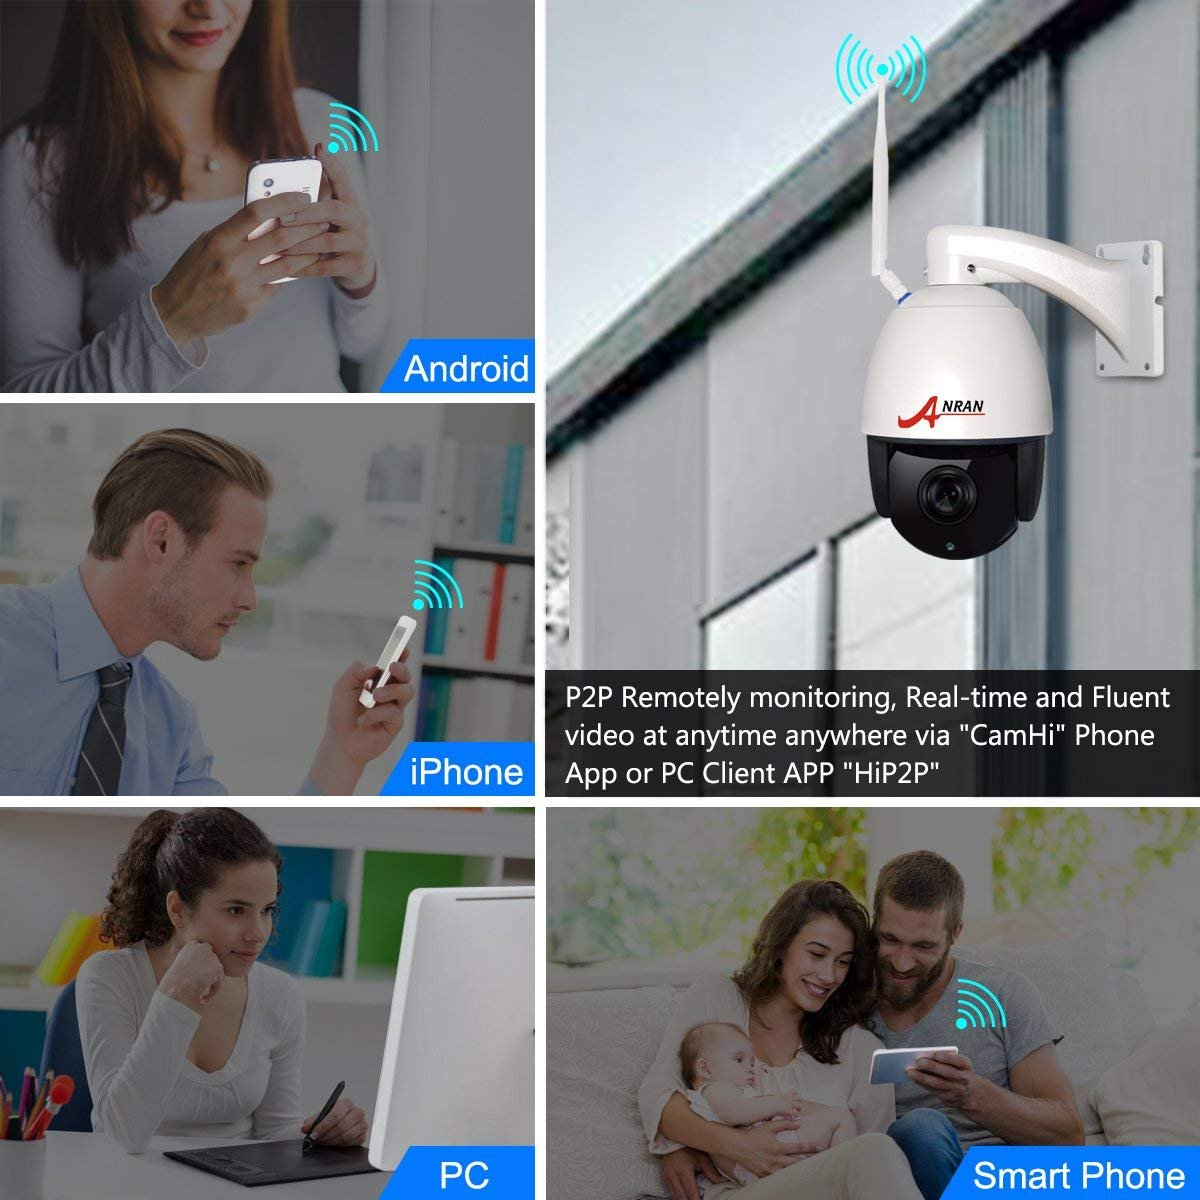 ANRAN 1080P Wireless IP Surveillance Security Camera PTZ 4×Optical Zoom  High Speed Dome Home Security CCTV Indoor/Outdoor Waterproof IP66,355°Pan